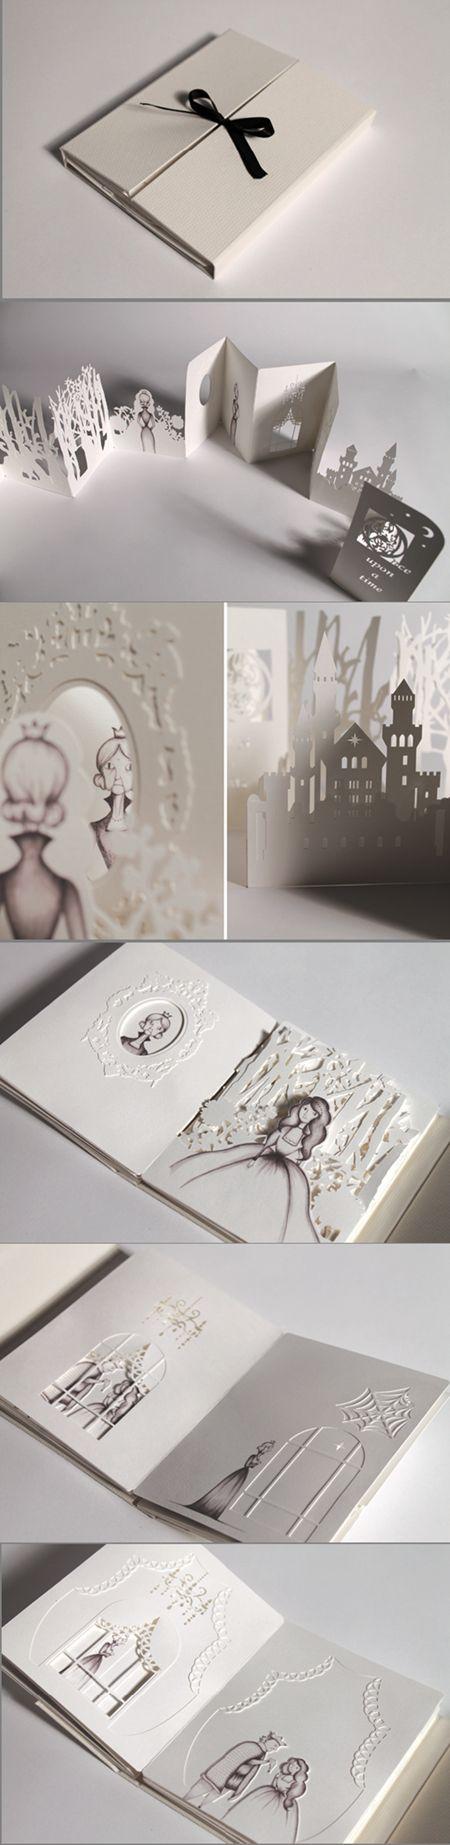 AMAZING Hiroko Matshushita的剪纸书作品